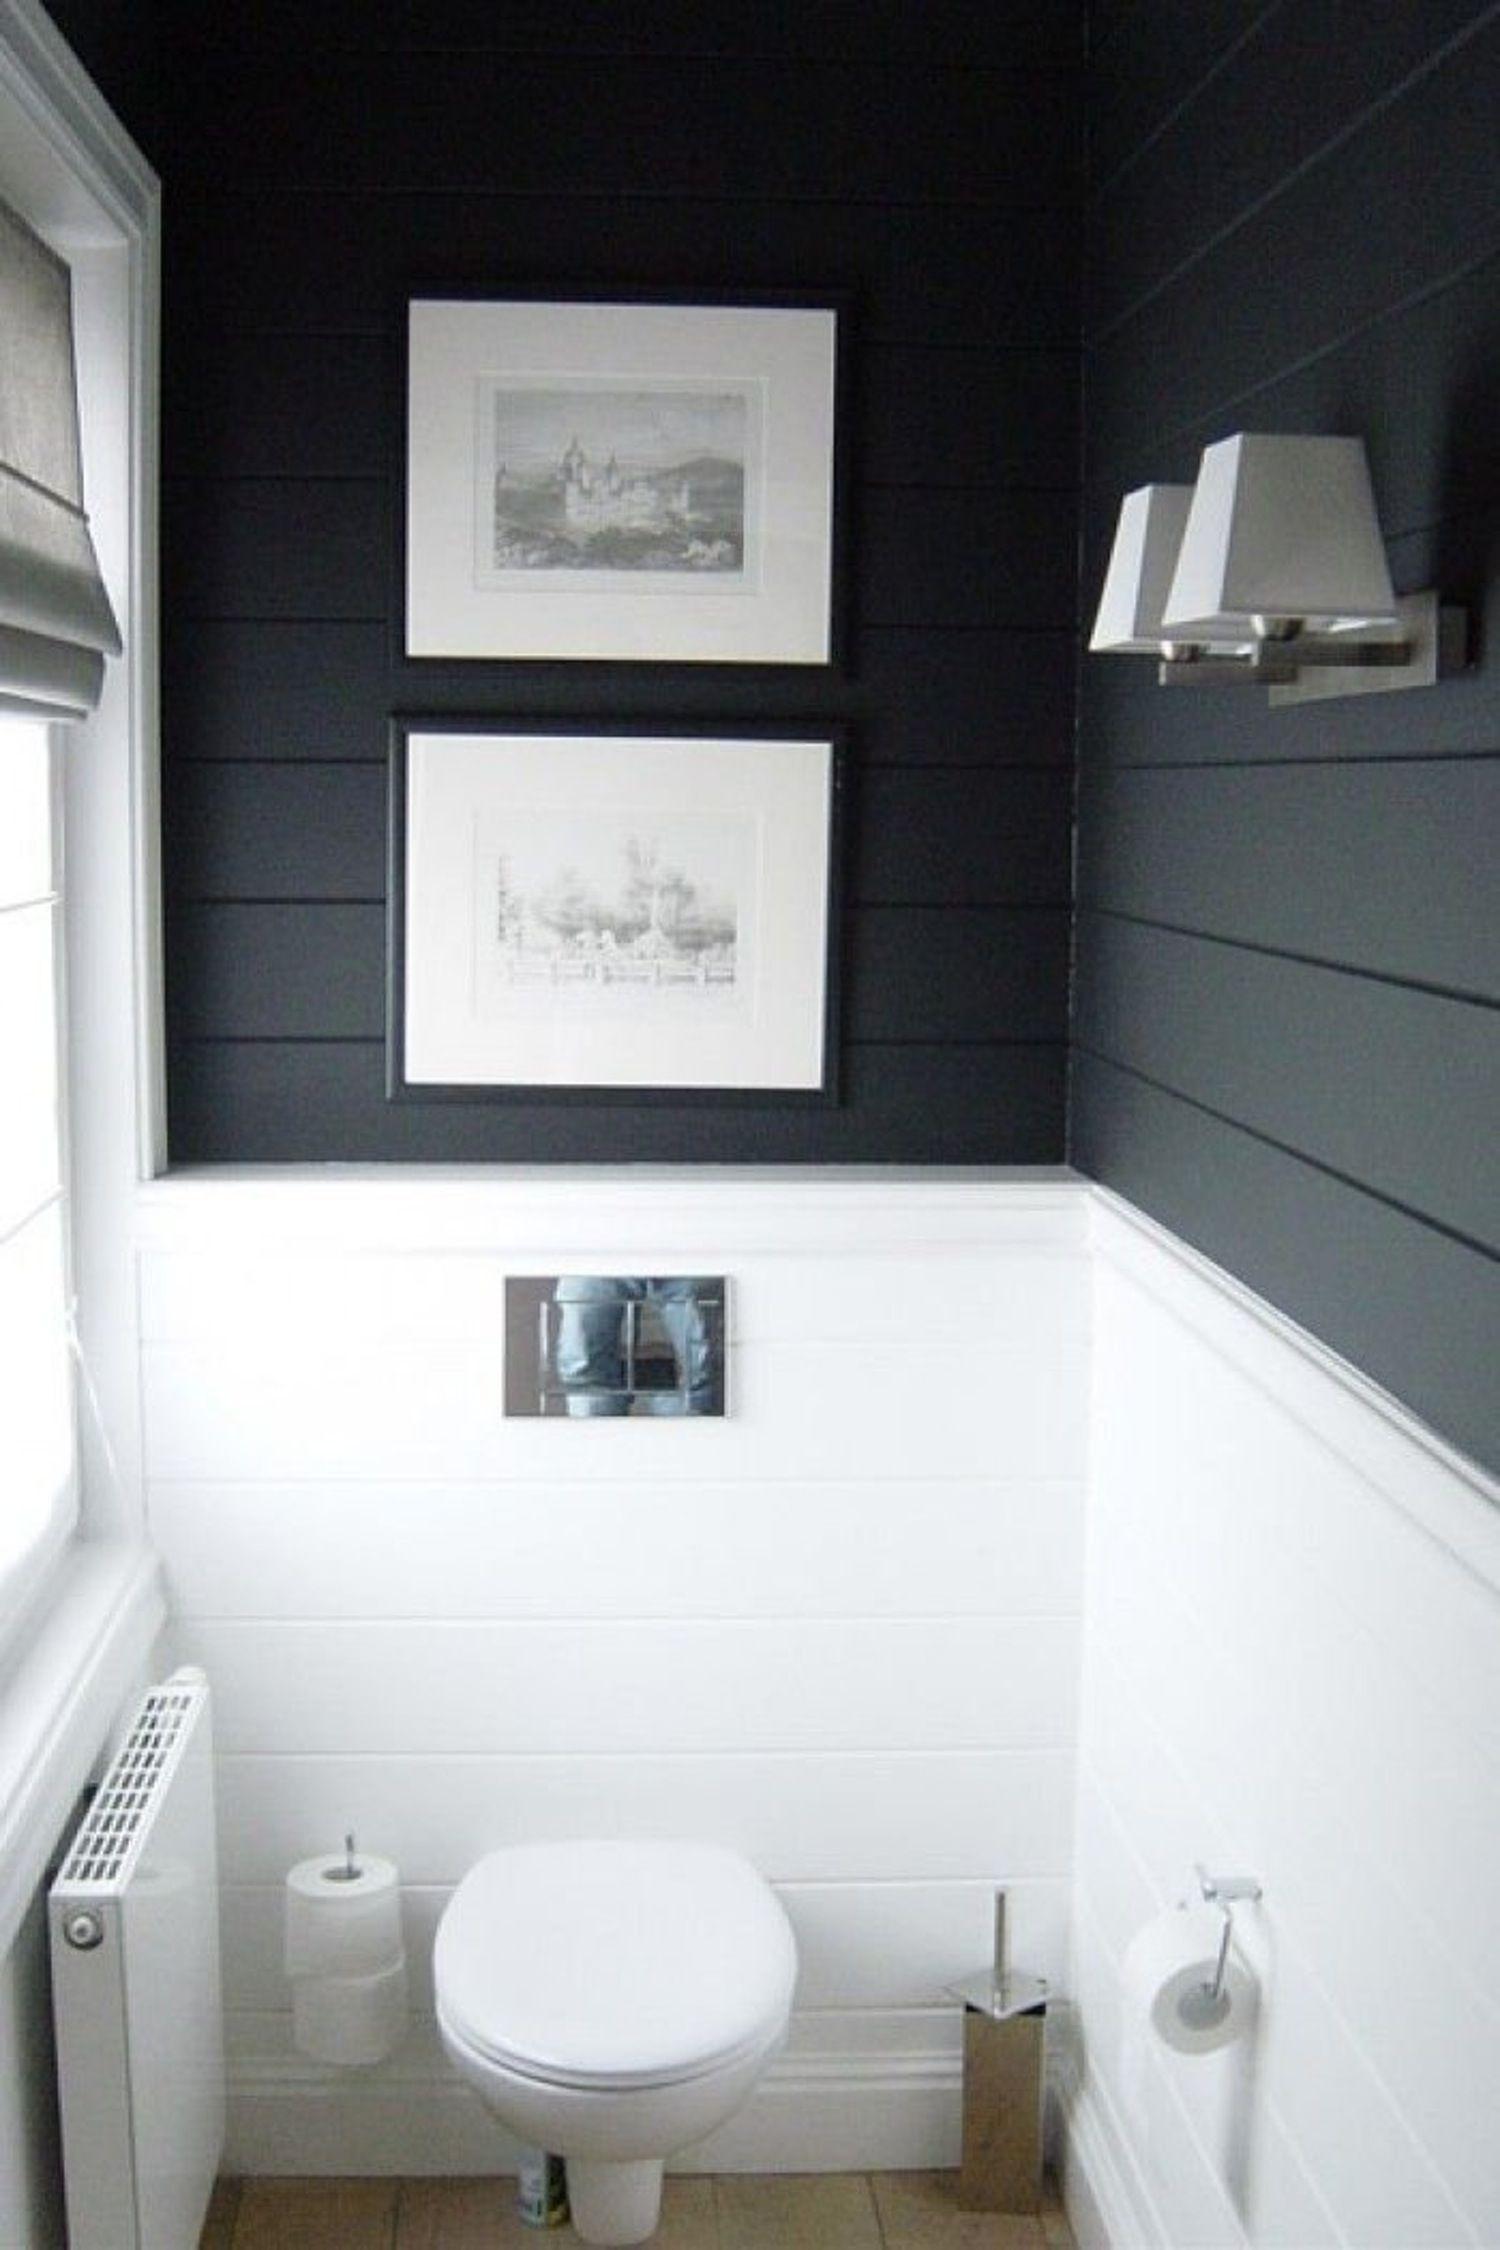 New Takes On Traditional Bathroom Classics Shiplap Subway Tiles Checkerboard Floors More Cottage Bathroom Laundry In Bathroom Bathroom Ship Lap Walls